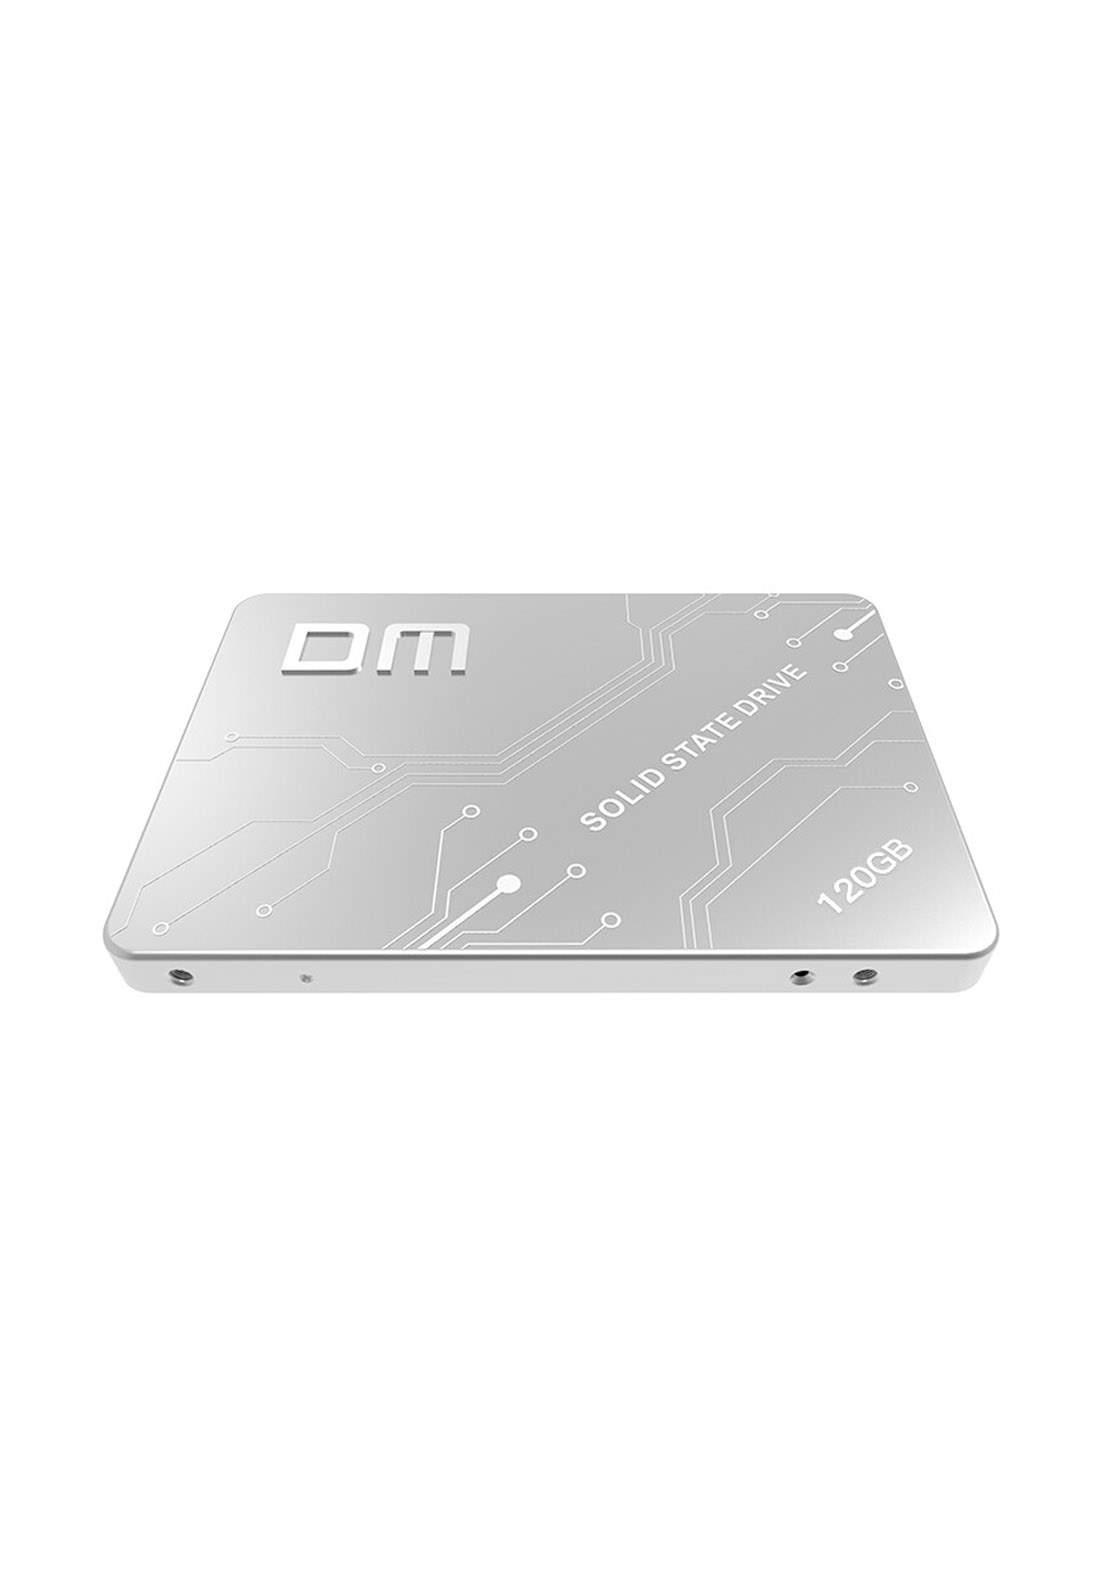 DM F500 SSD 120GB Internal Hard Disk- Silver هارد داخلي